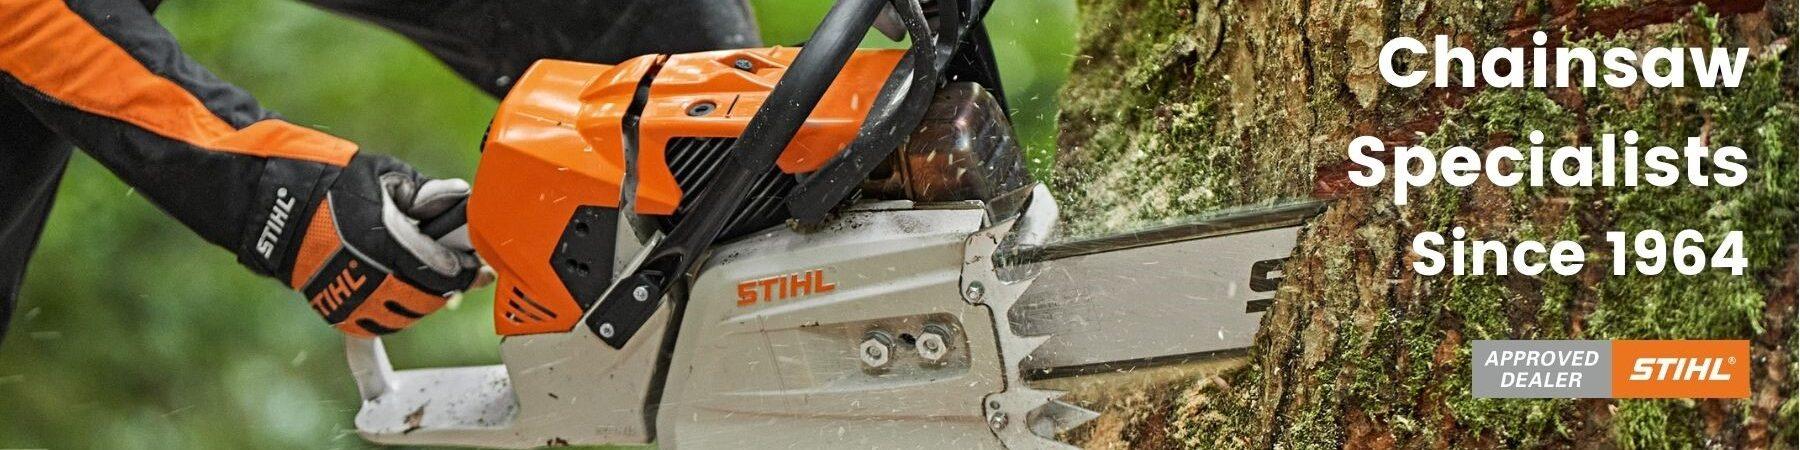 Briants of Risborough Ltd - Chainsaw Specialists